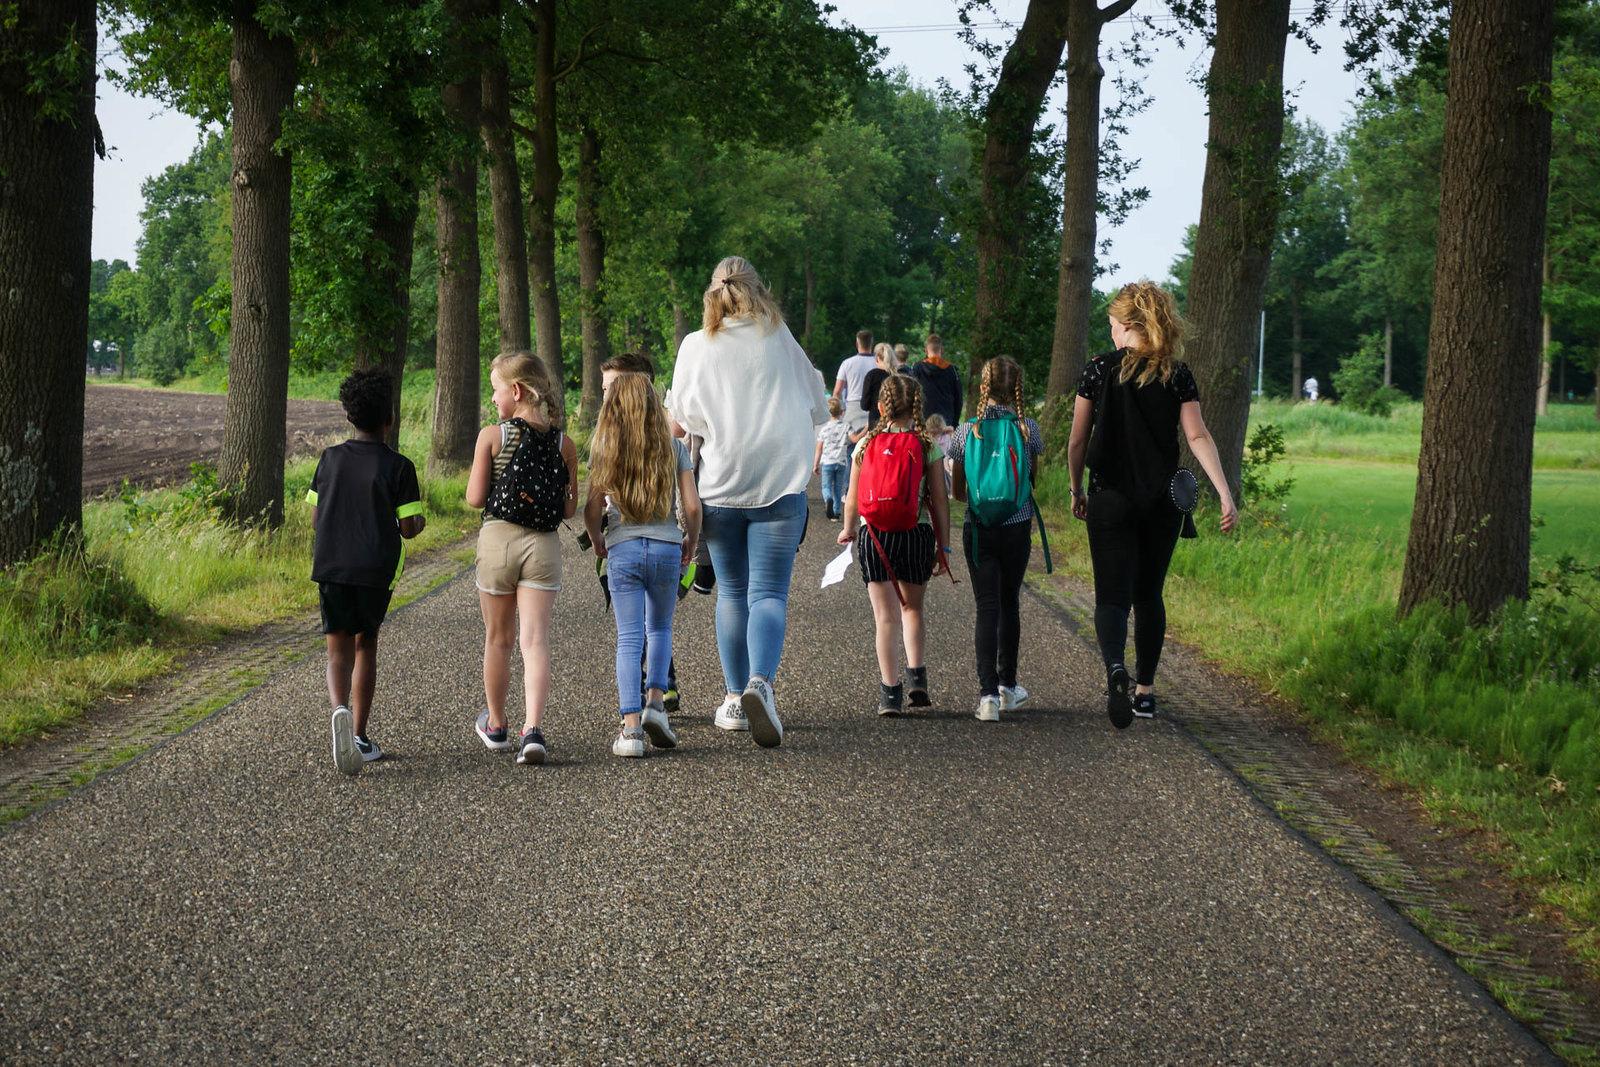 Geslaagde editie Avond4daagse Oirschot & FinishFeest 2019